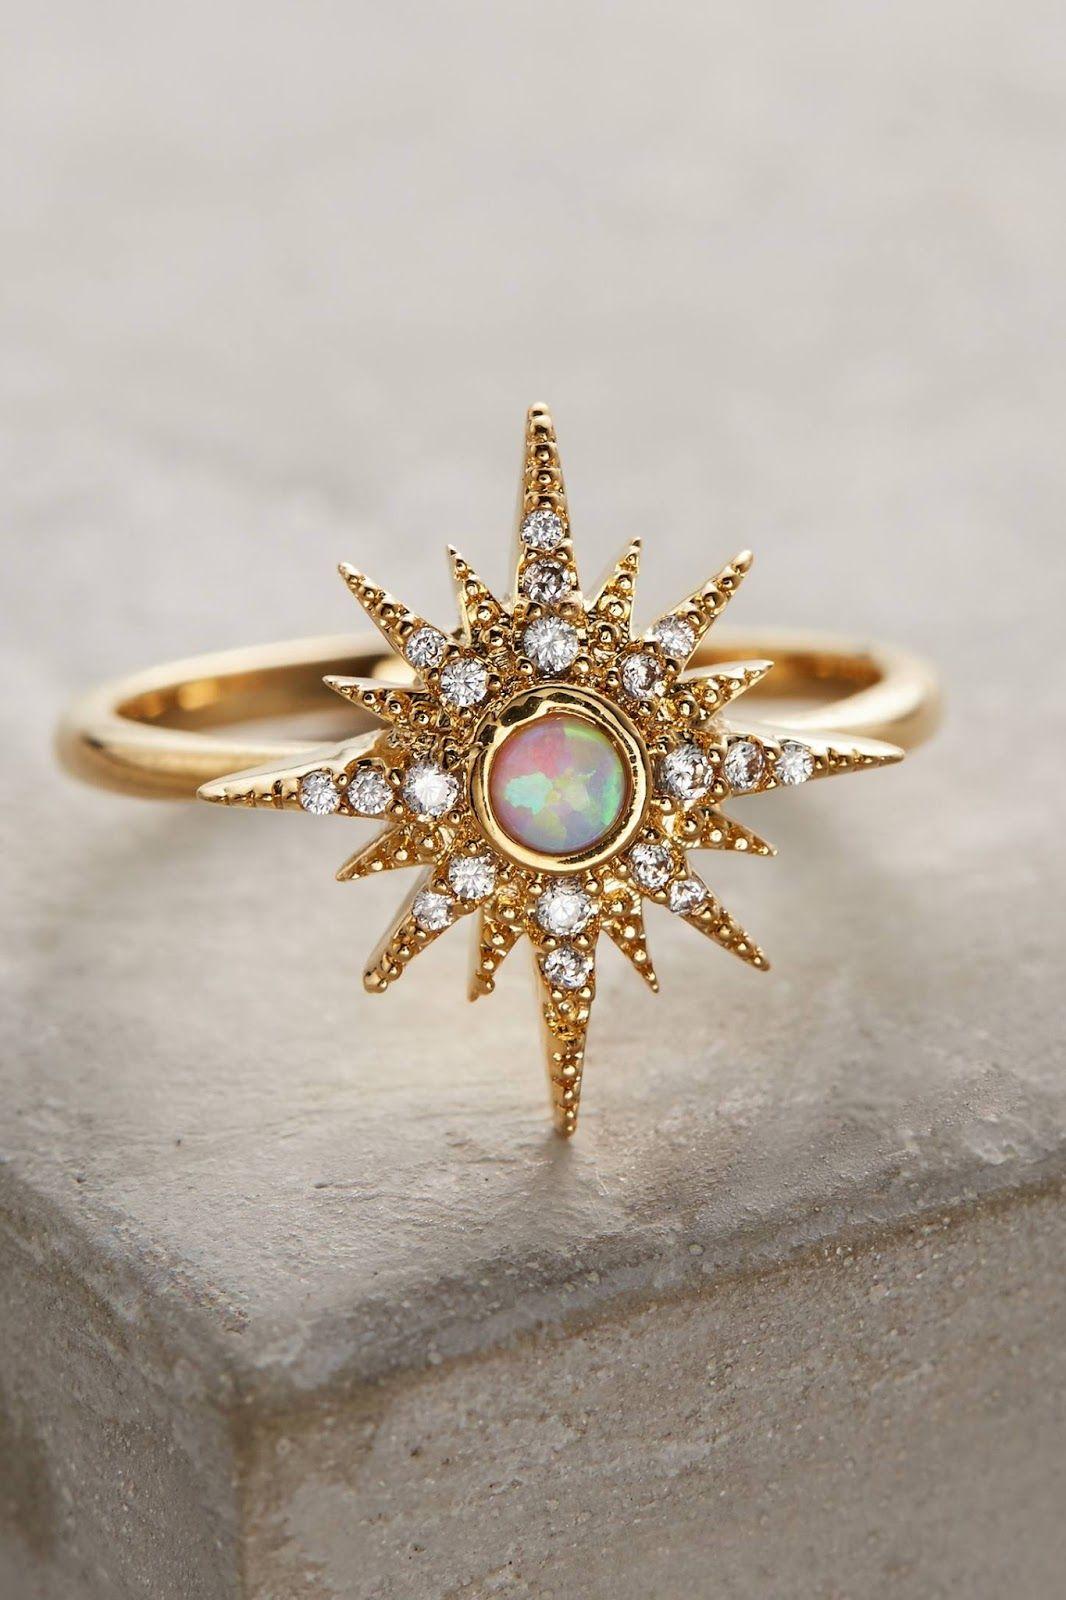 a183003f83a186 18K Yellow Gold Plated White Opal Ring Fashion Women Wedding Bridal Jewelry  6-10 Fine